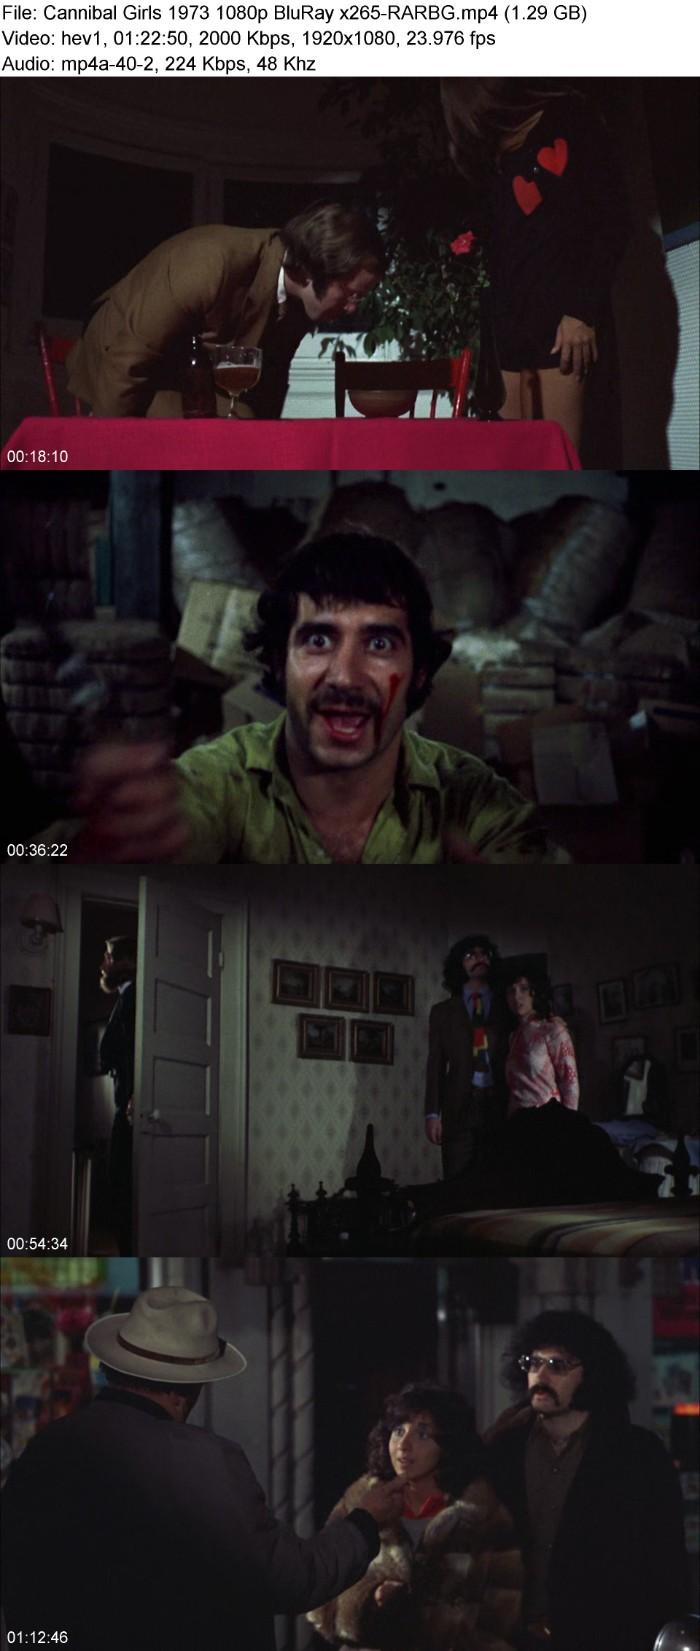 225249552_cannibal-girls-1973-1080p-bluray-x265-rarbg.jpg